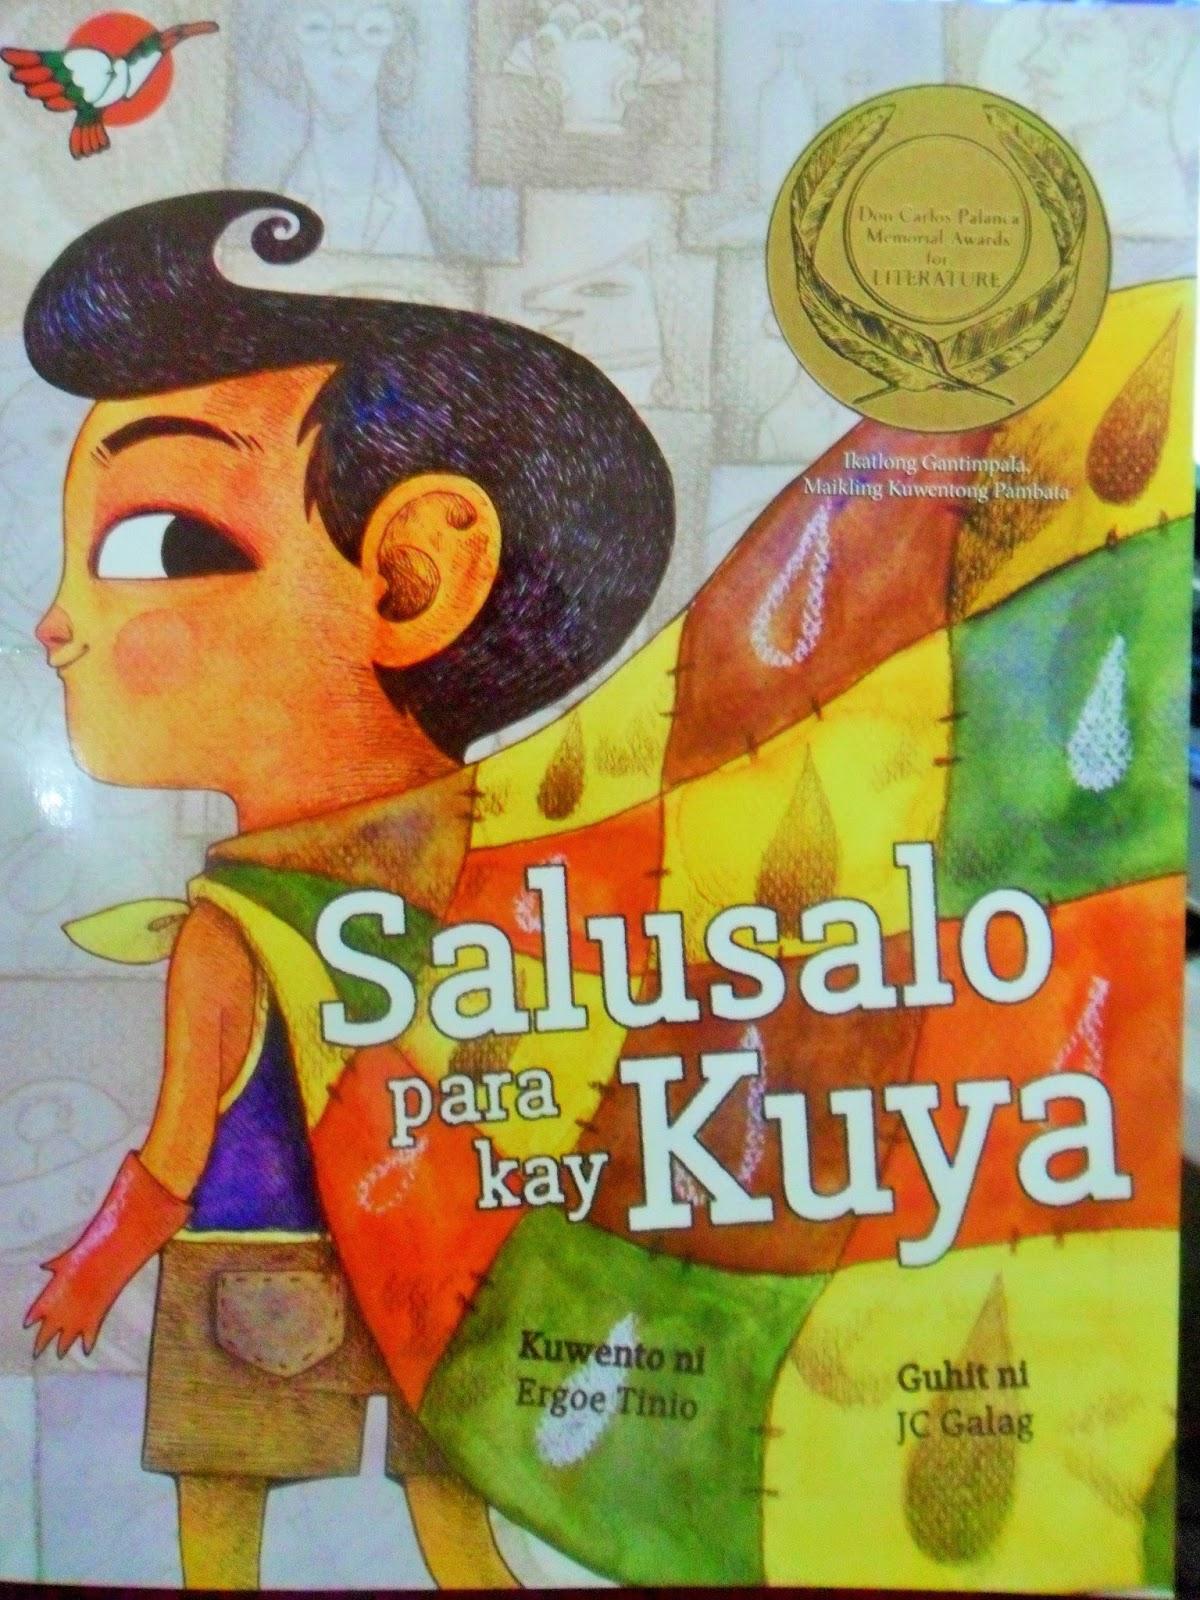 Book Review Salusalo Para Kay Kuya By Ergoe Tinio